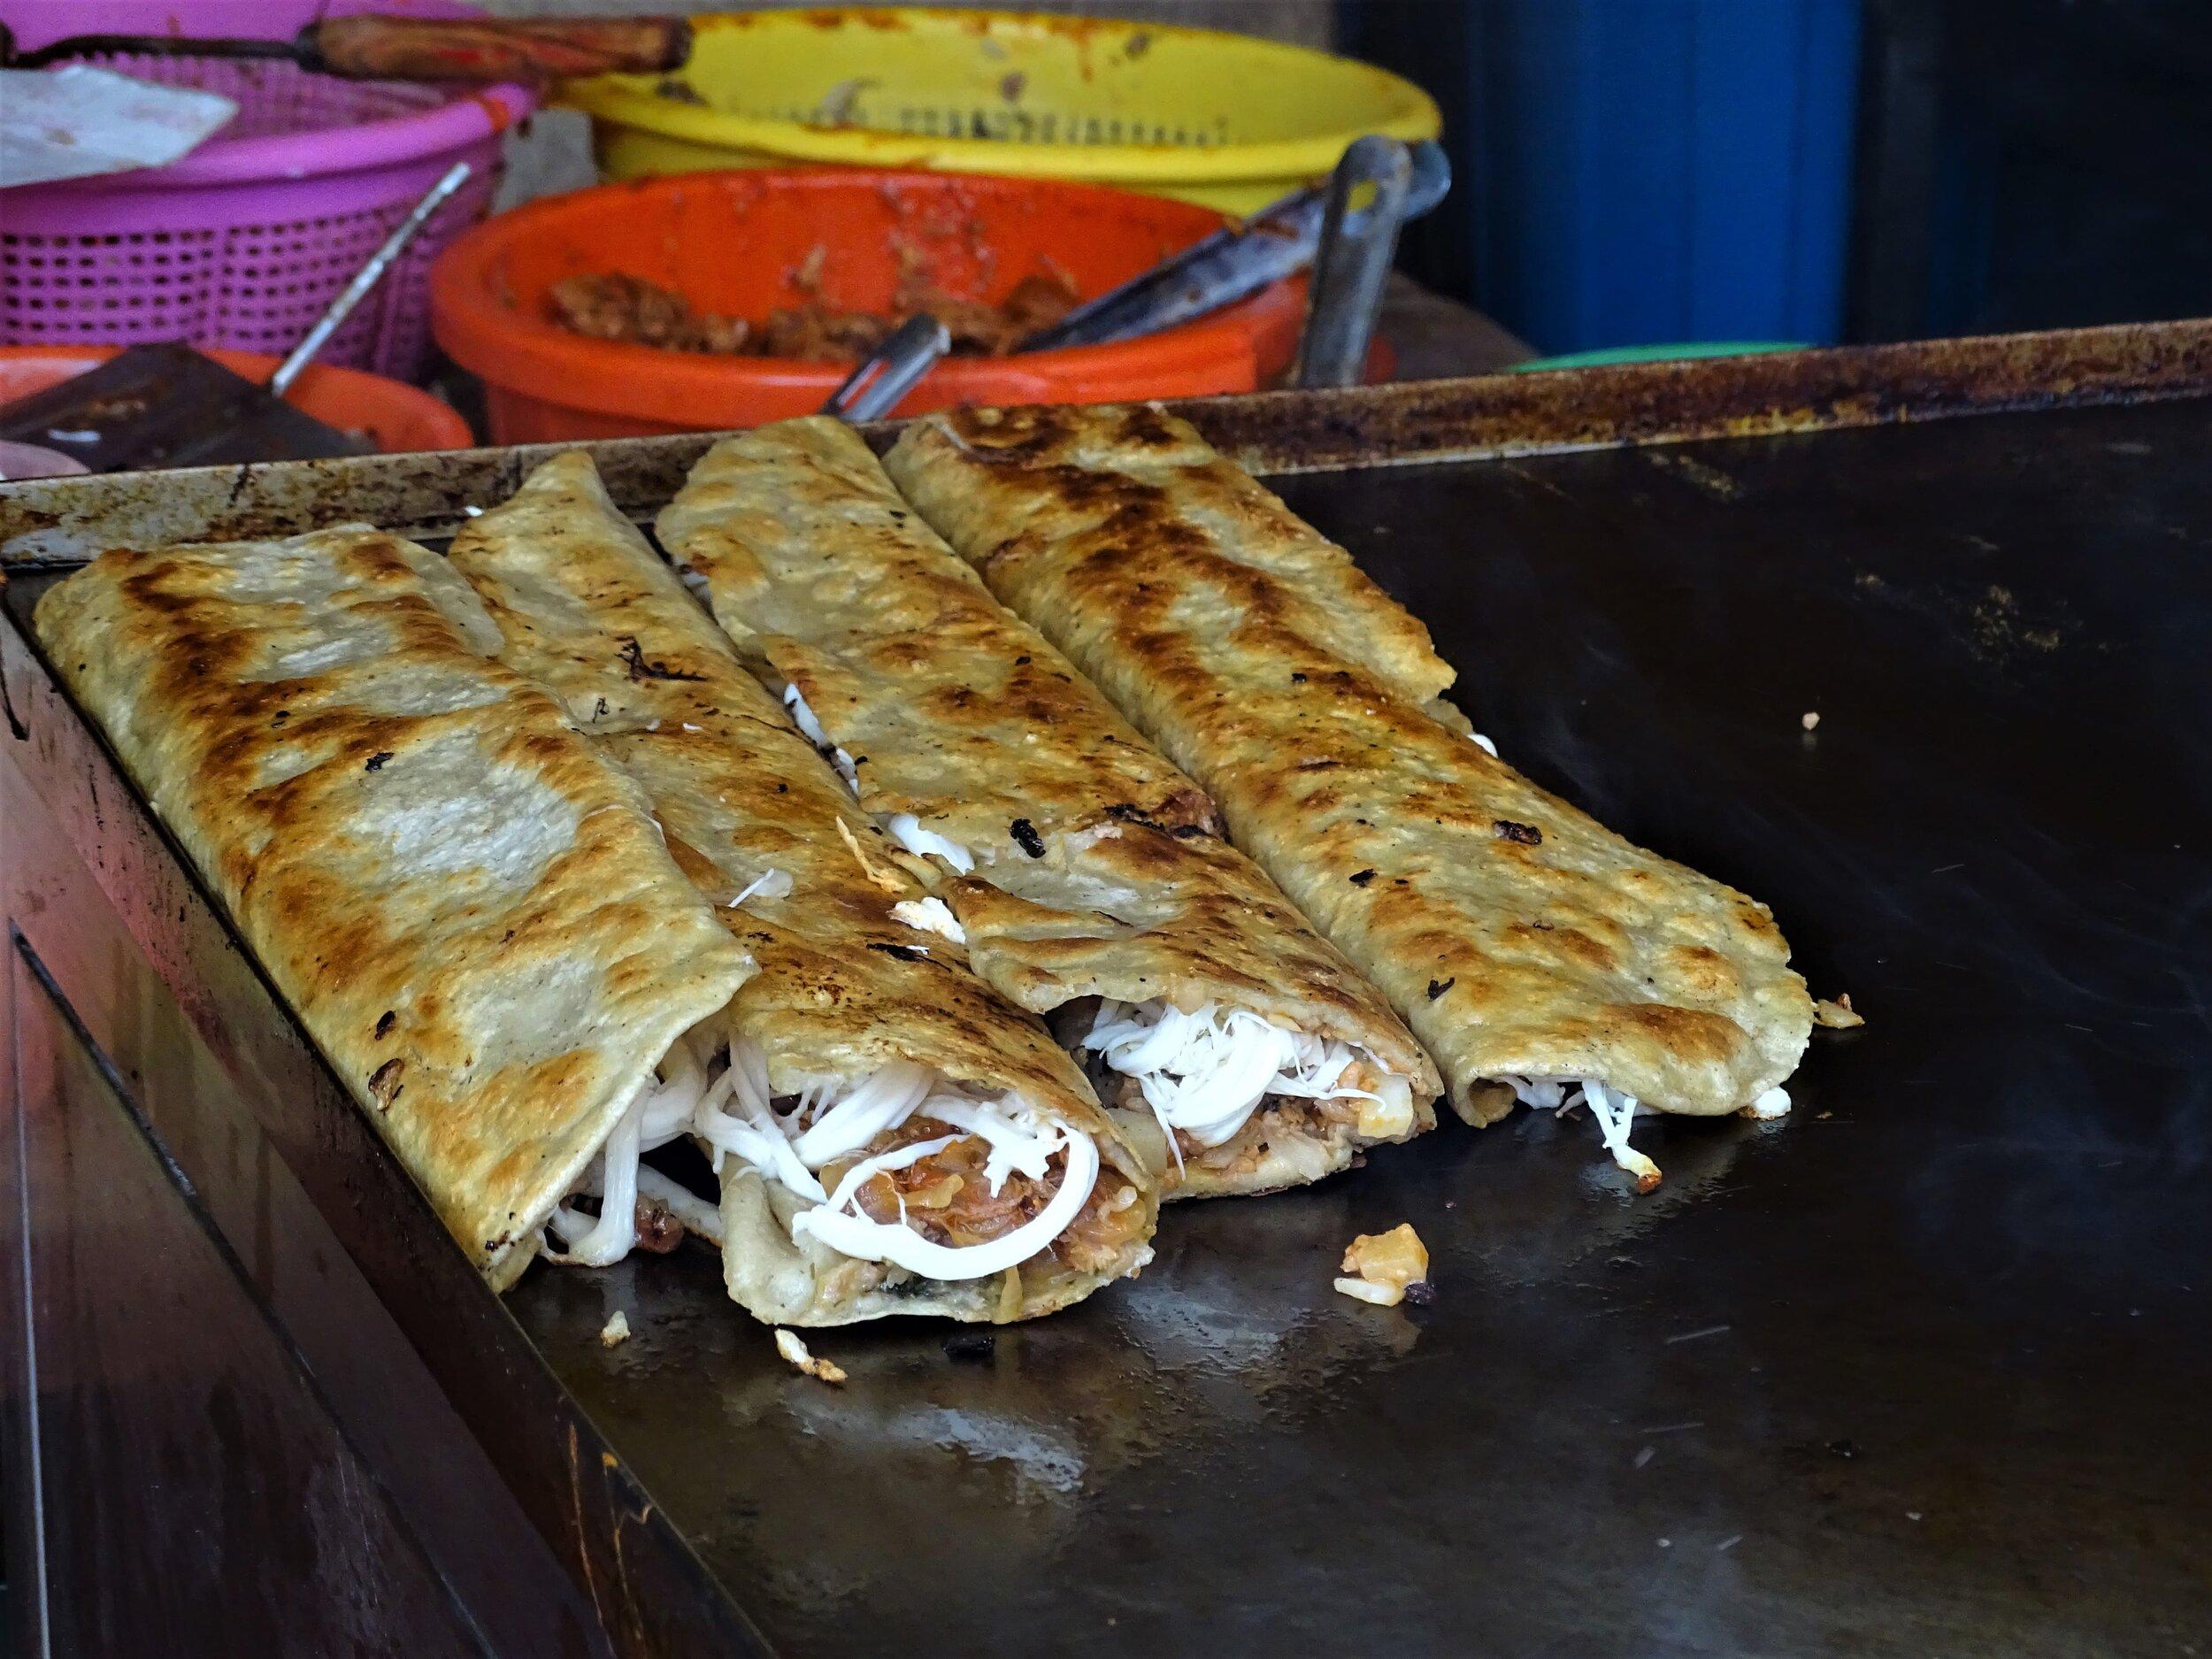 The extra-large Mexico City street food machetes.